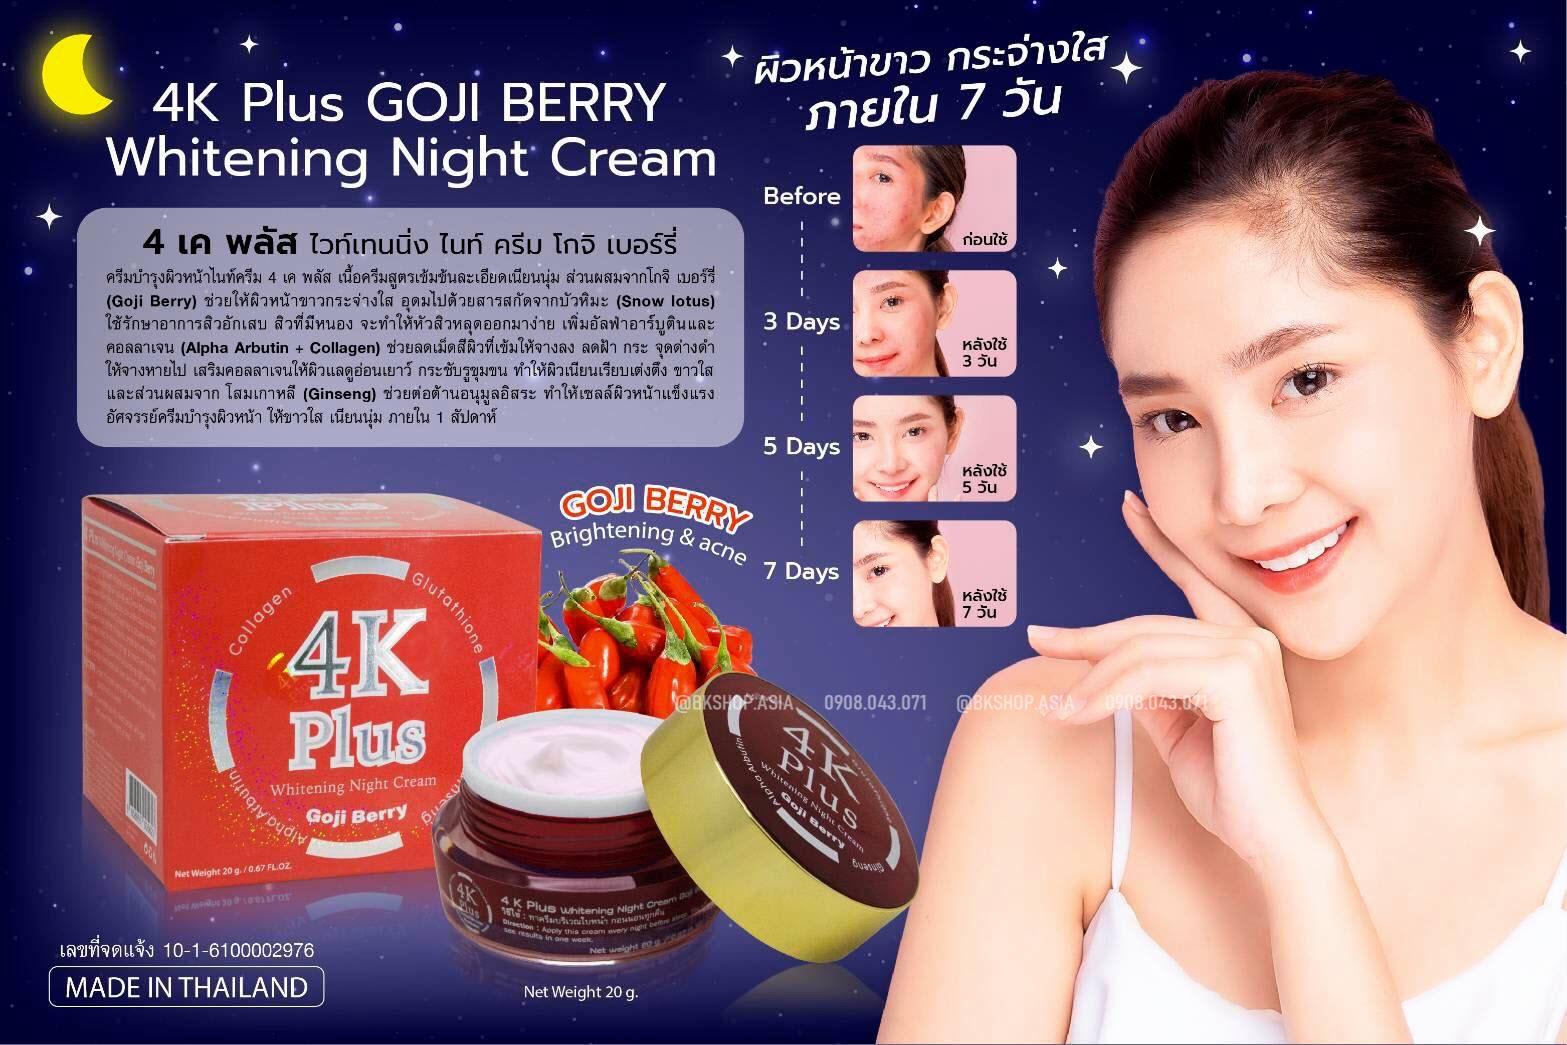 kem-duong-trang-da-kem-4k-plus-acne-tri-mun-tham-goji-berry-20g-thai-lan-2653